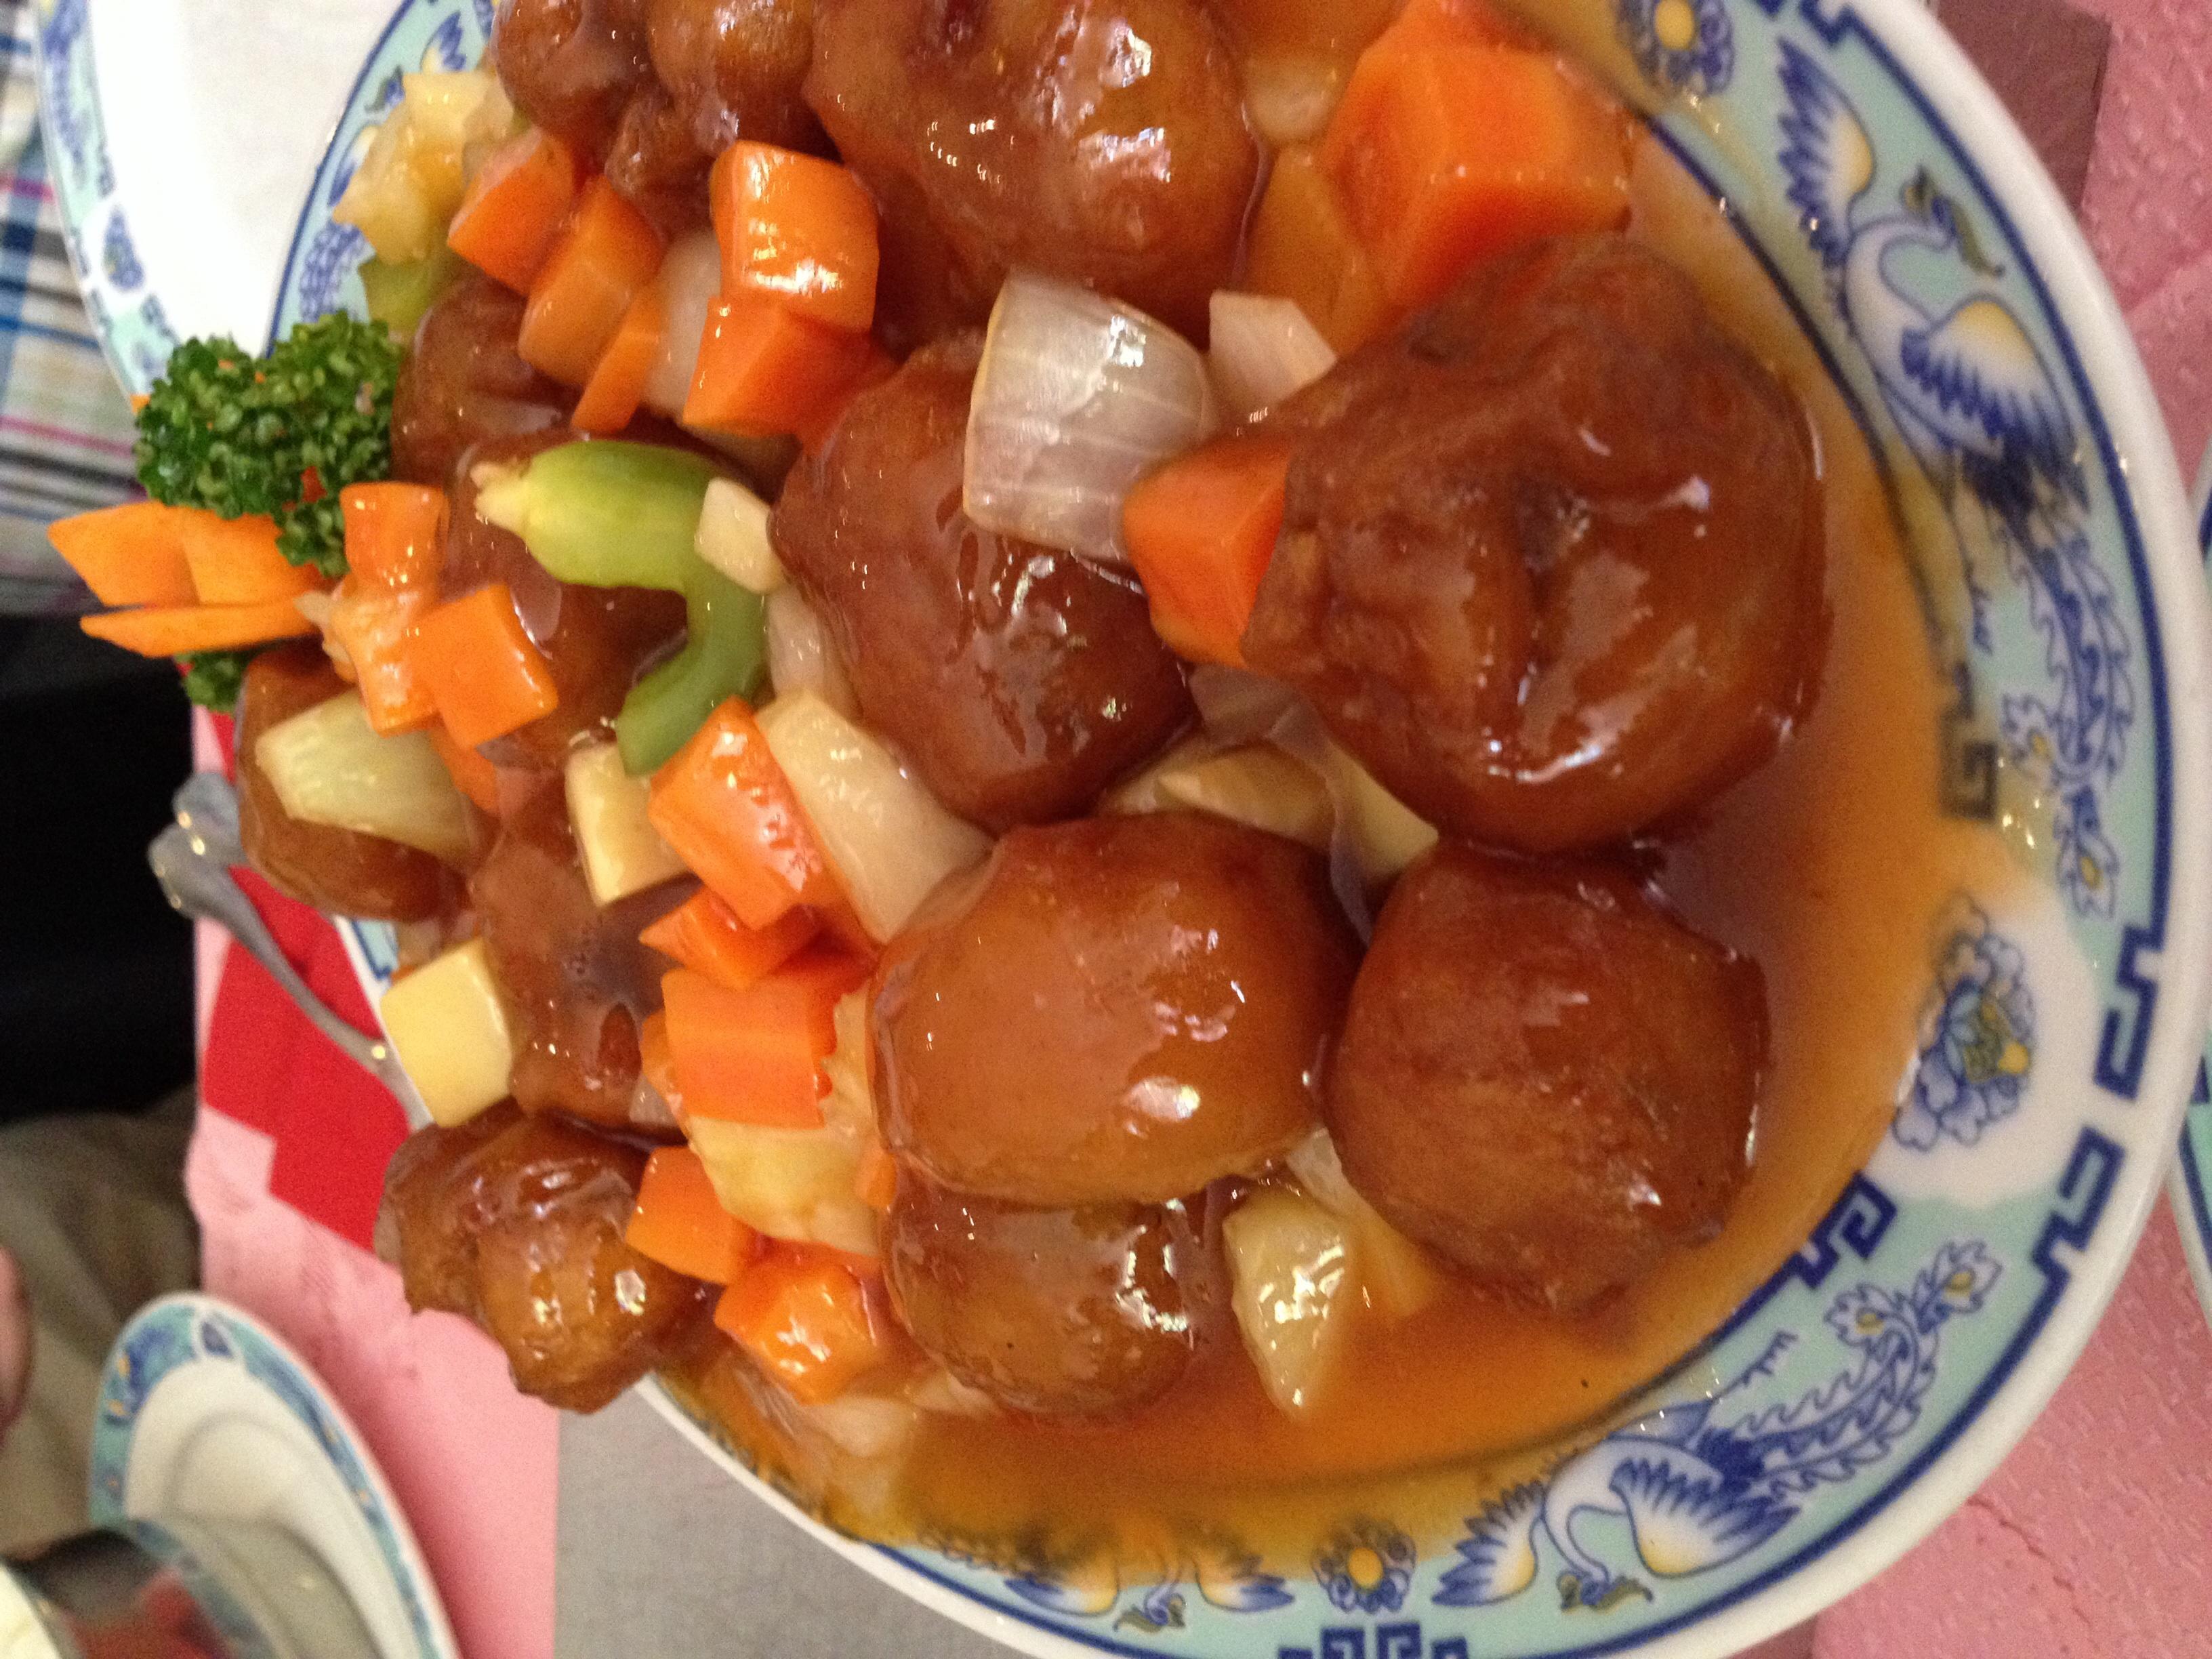 https://foodloader.net/BrollyLSSJ_2014-04-20_Sentosa_-_Schweinefleisch_gebacken_s_____sauer.jpg